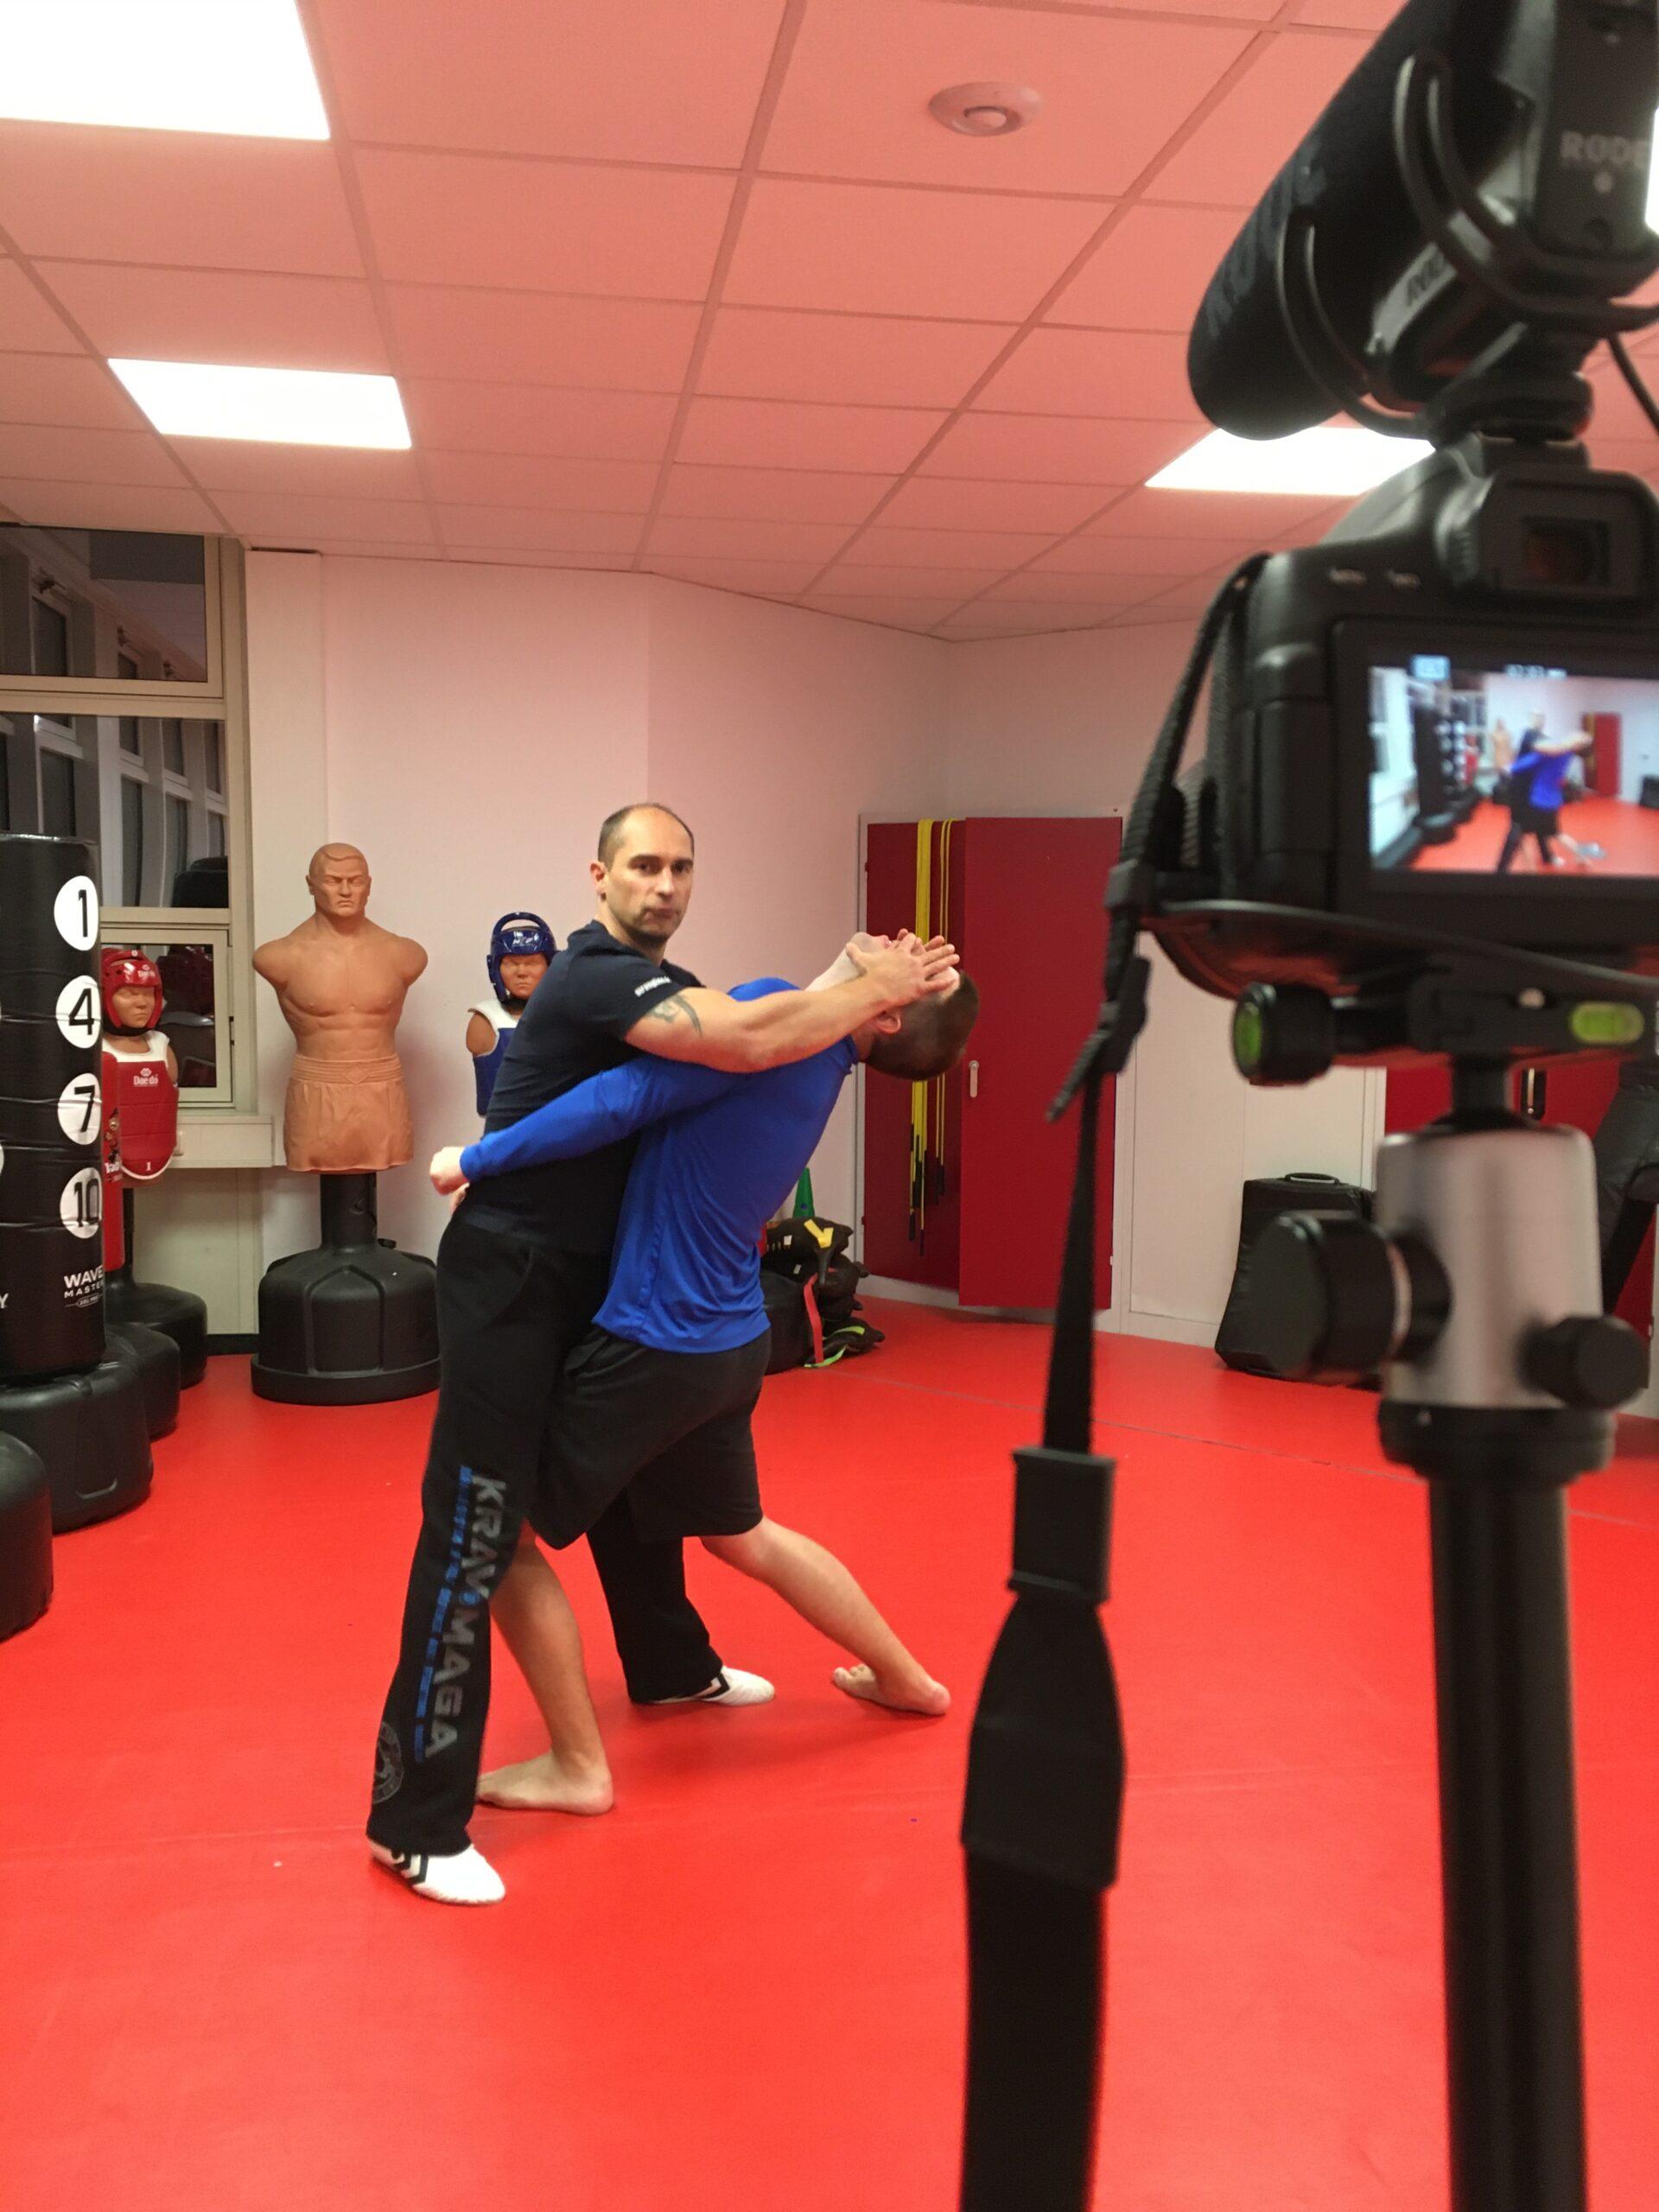 Marcel Descy - Selbstverteidigung - Personal Online Coaching